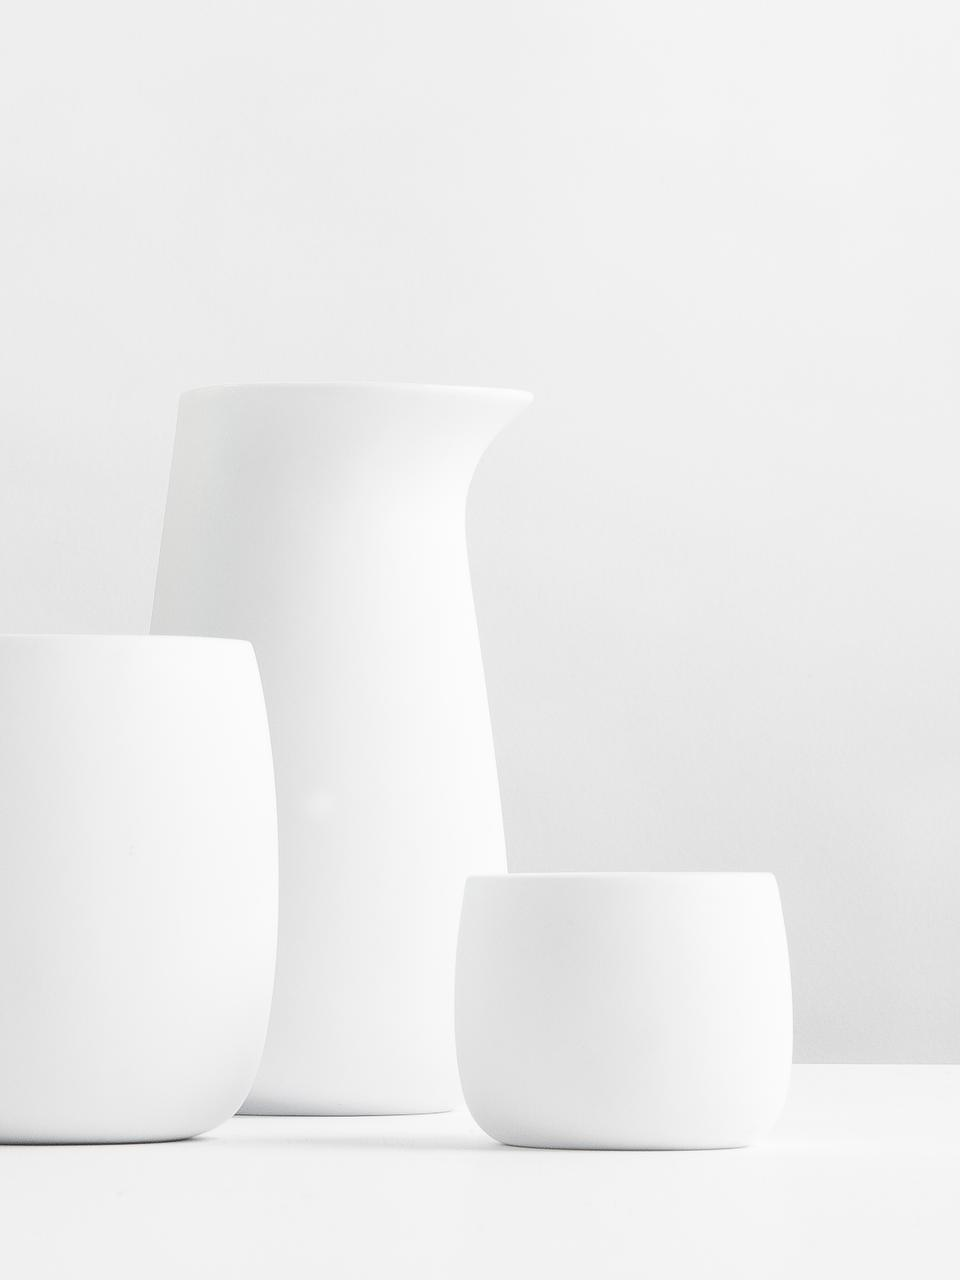 Tazzina caffè in porcellana Foster 2 pz, Porcellana, Esterno: bianco opaco Interno: bianco lucido, 40 ml